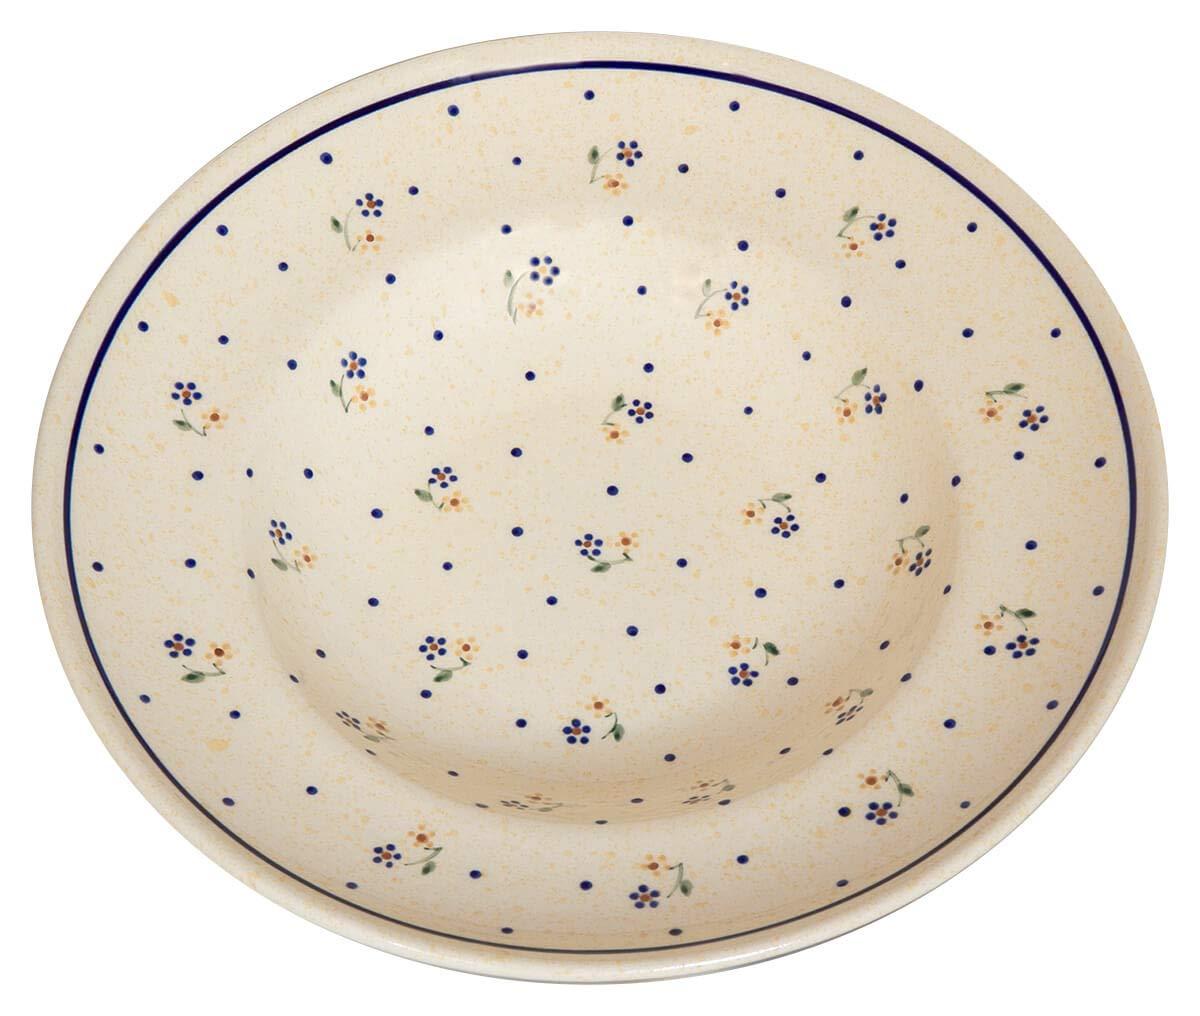 Pottery Ceramic plates (GU1421–111 Pastateller